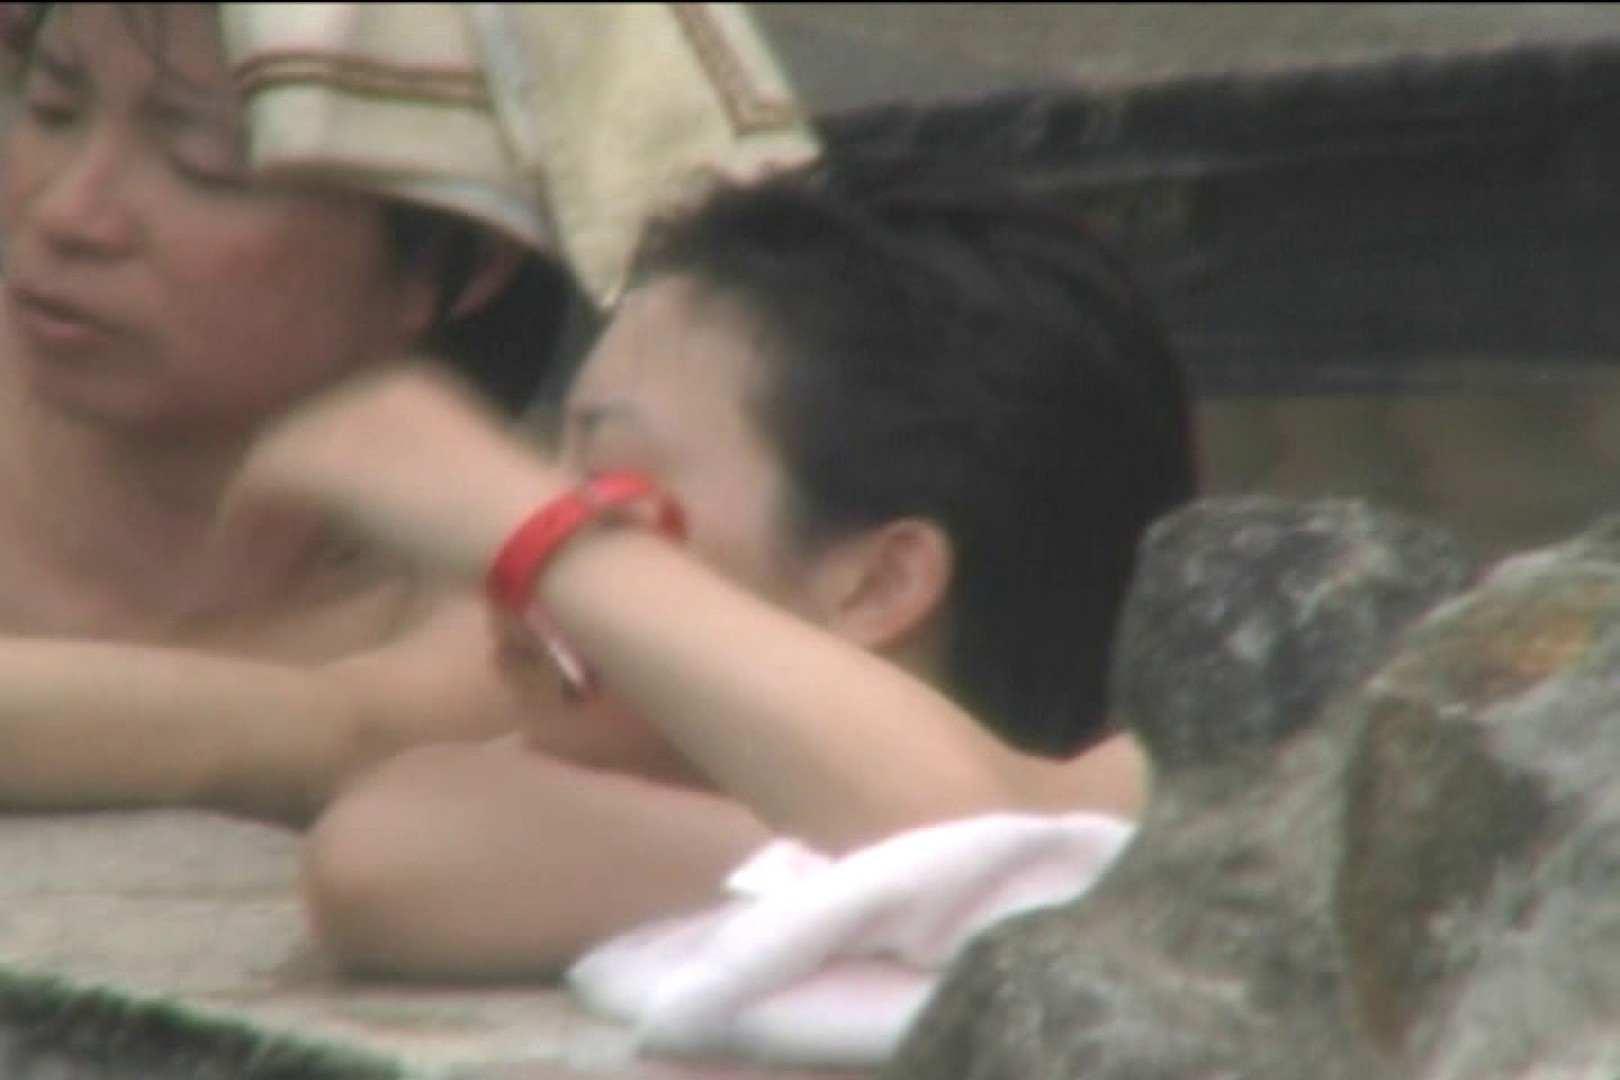 Aquaな露天風呂Vol.122 エッチな盗撮 オメコ無修正動画無料 107pic 38